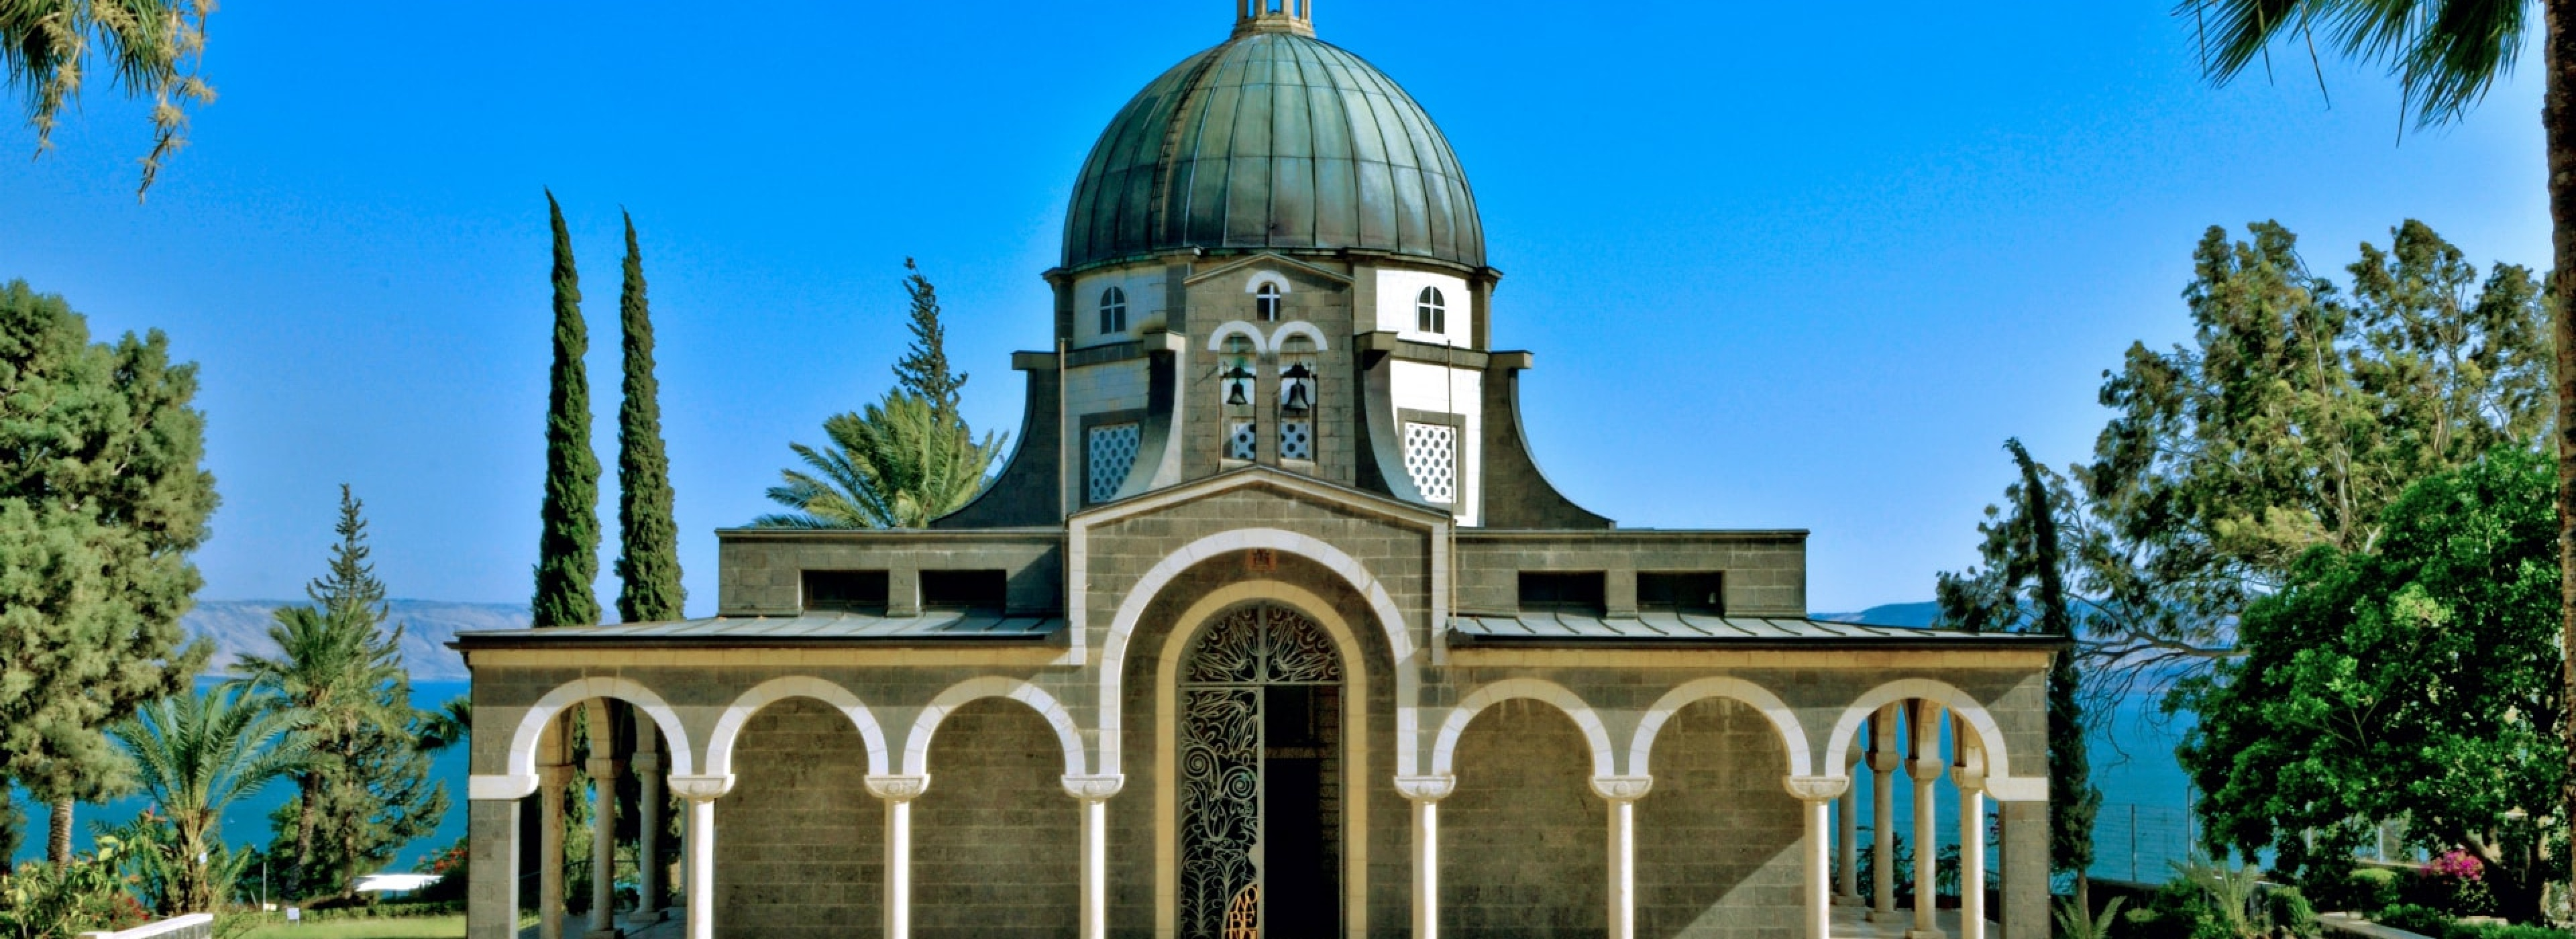 Mount of Beatitudes, Israel